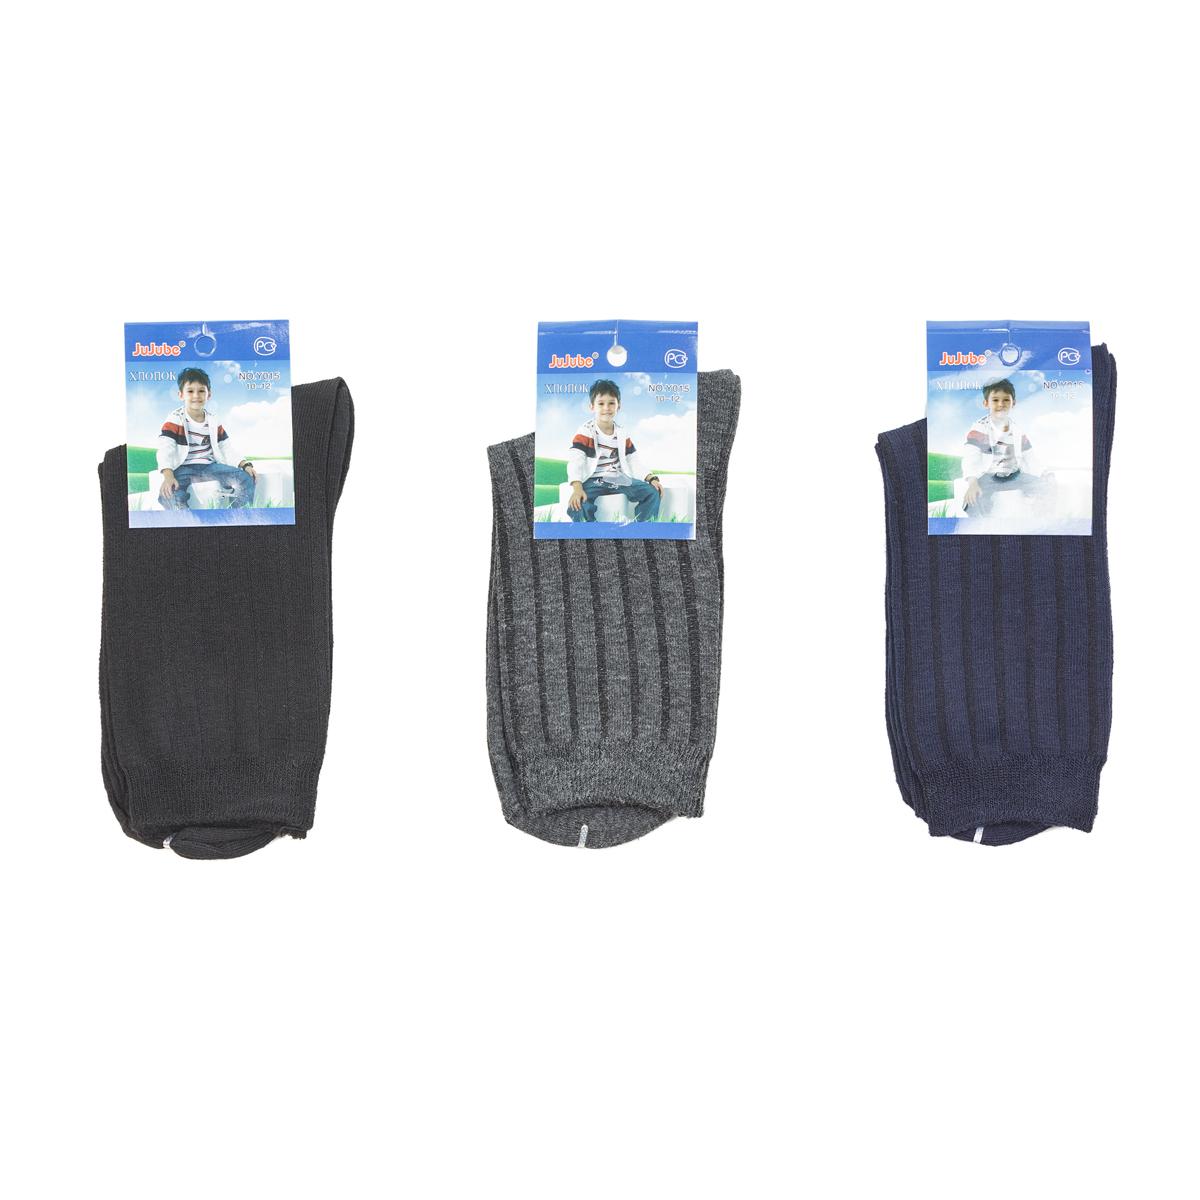 Дет. носки арт. 12-0035 Серый р. 36-39Распродажа<br><br><br>Тип: Дет. носки<br>Размер: 36-39<br>Материал: Трикотаж